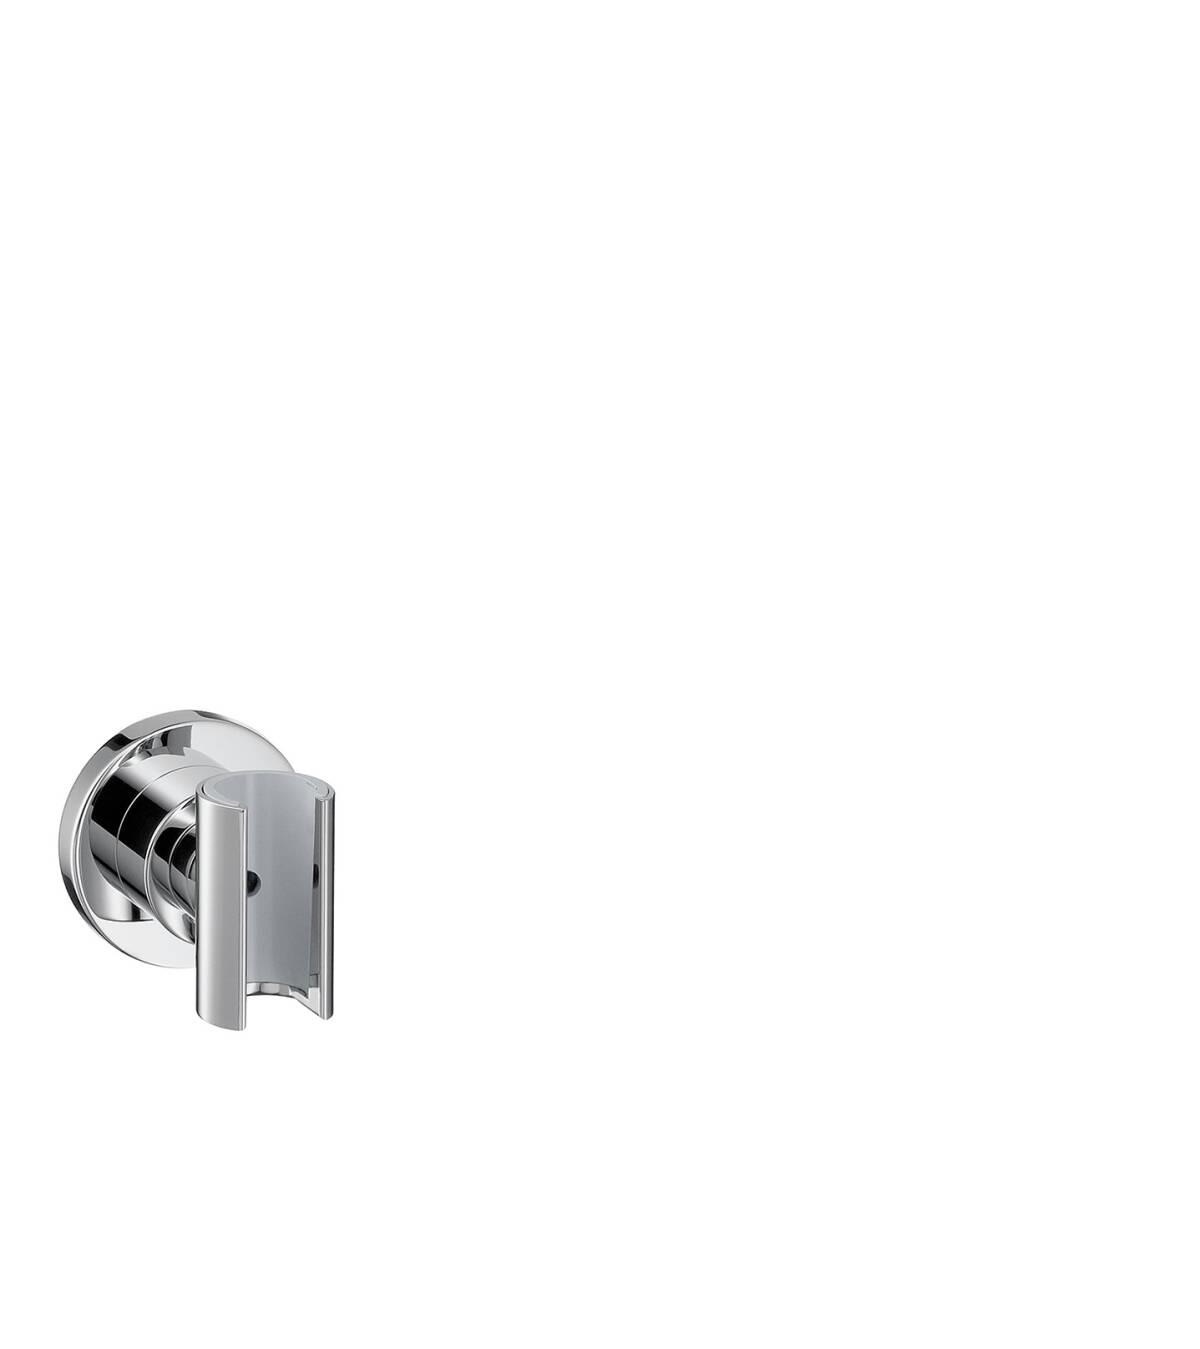 Shower holder round, Brushed Brass, 39525950